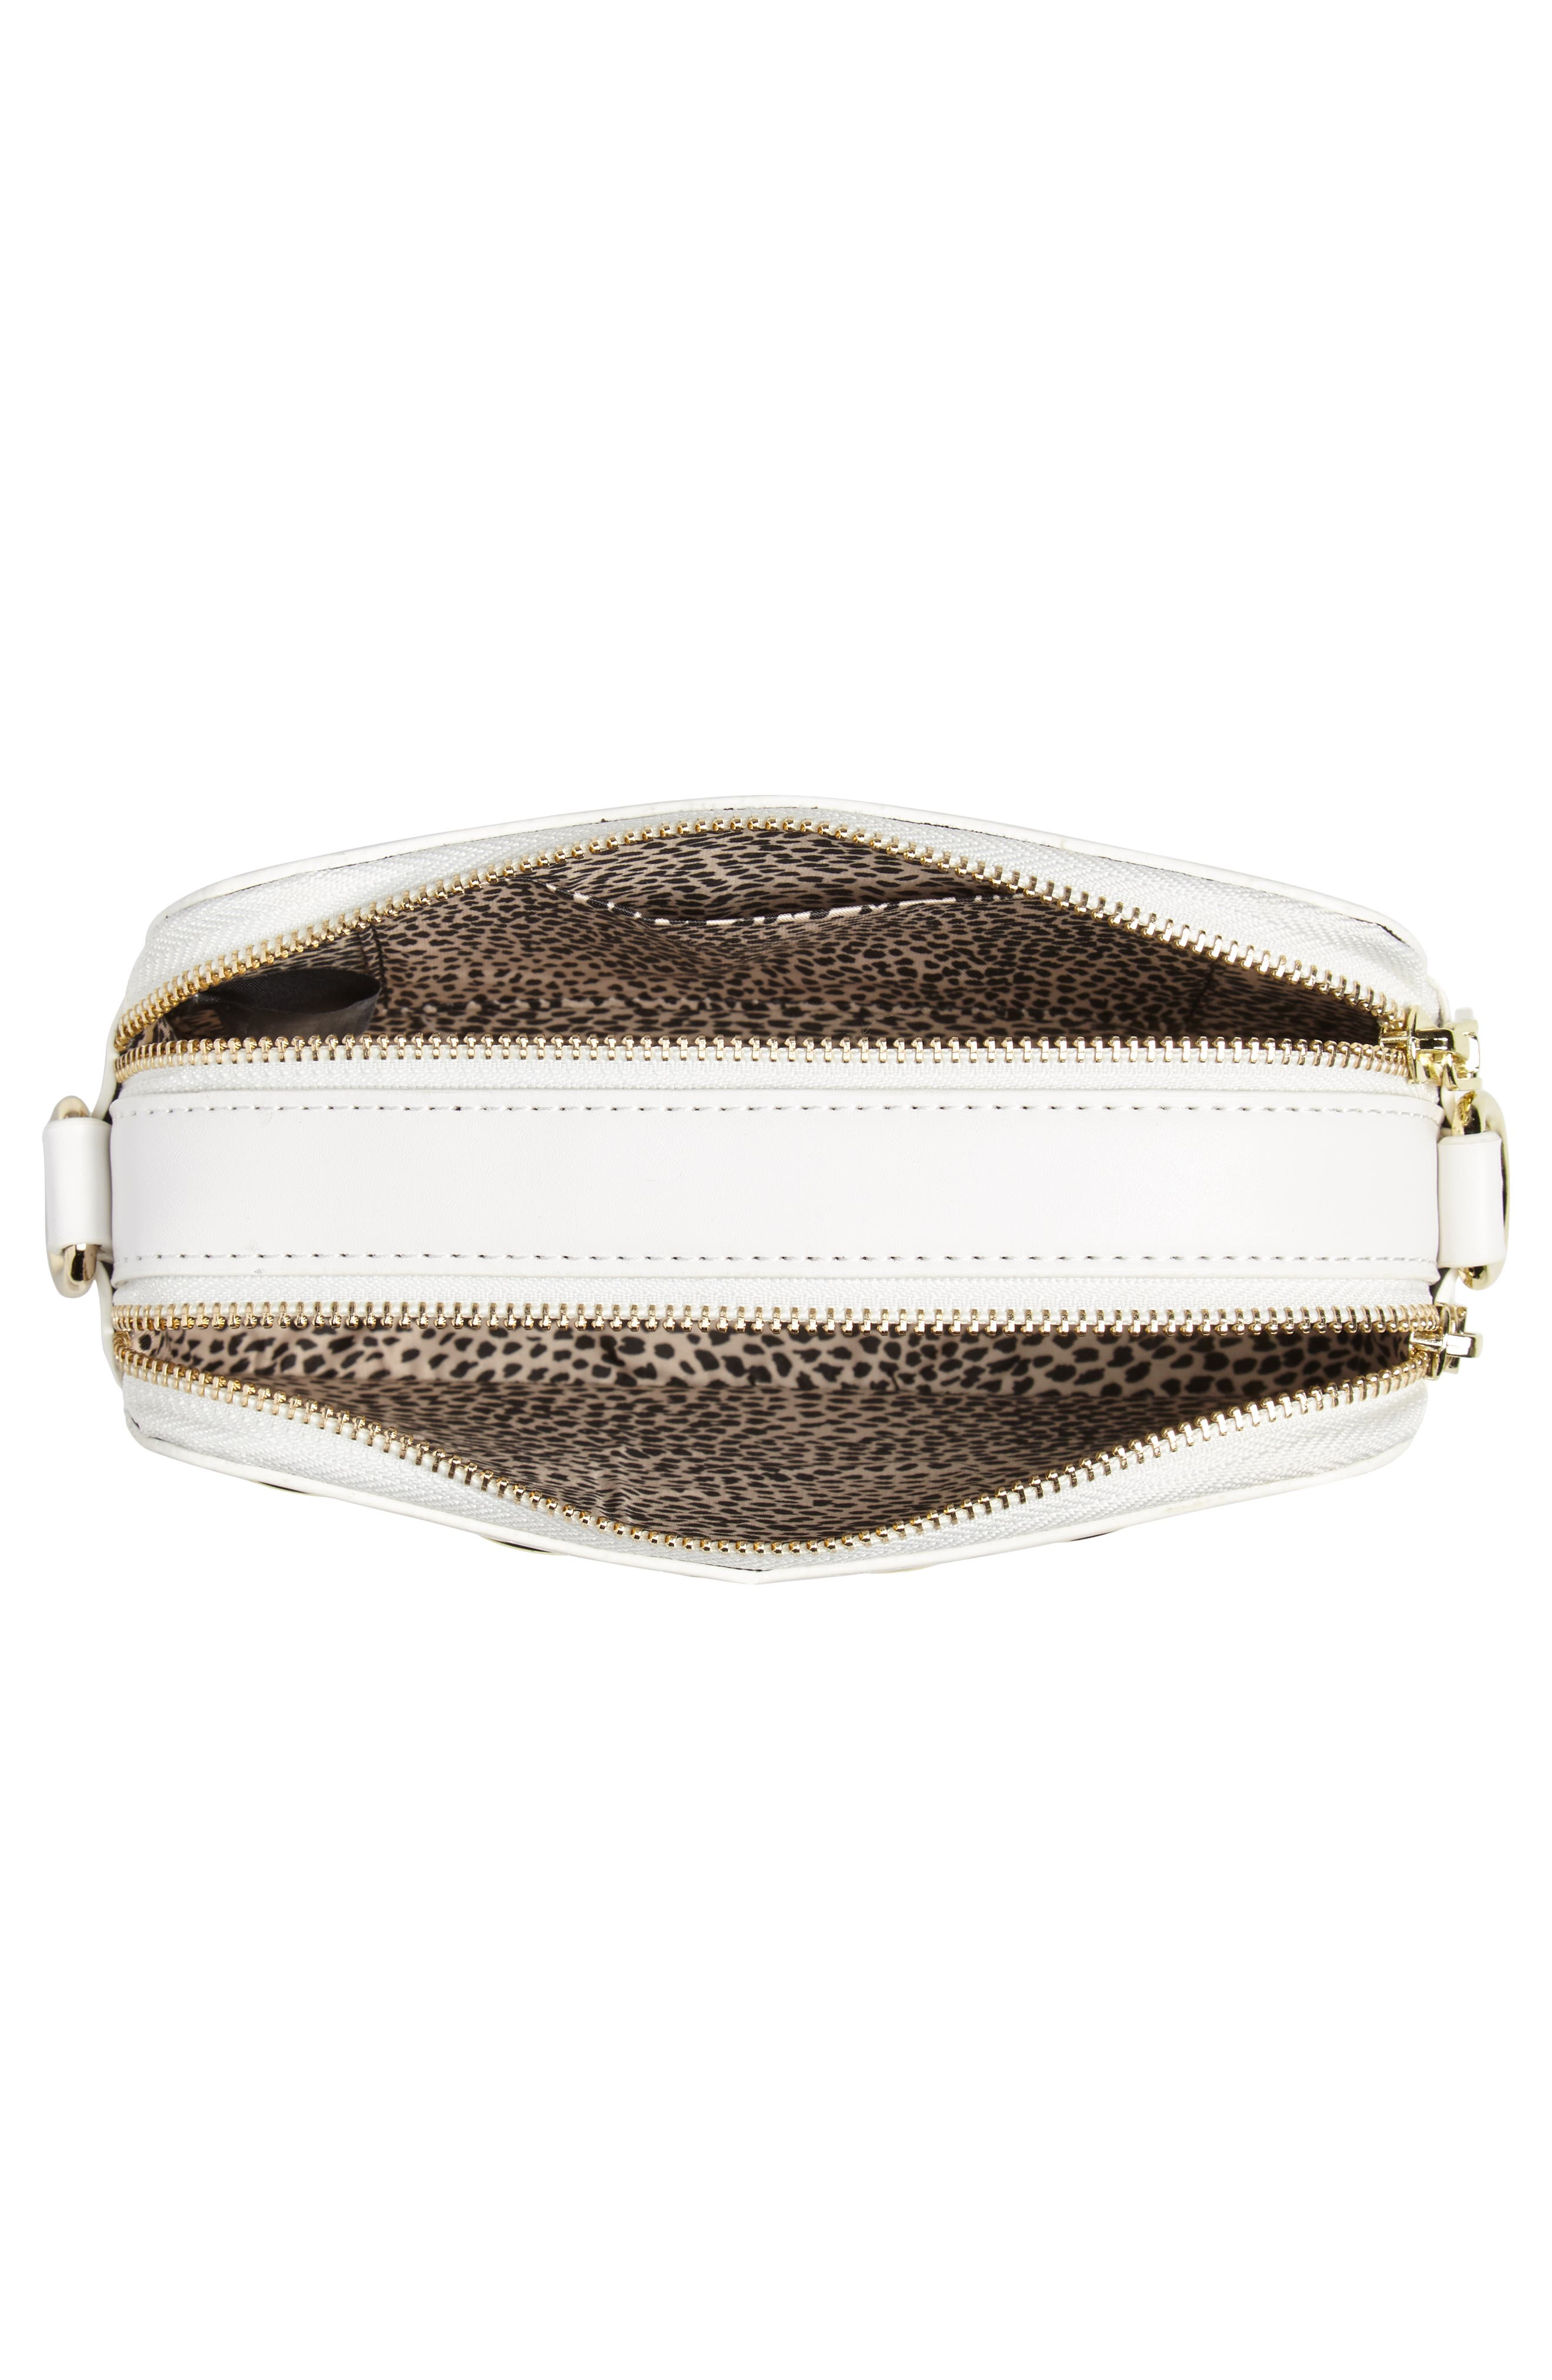 Dyana Grommet Faux Leather Crossbody Bag,                             Alternate thumbnail 8, color,